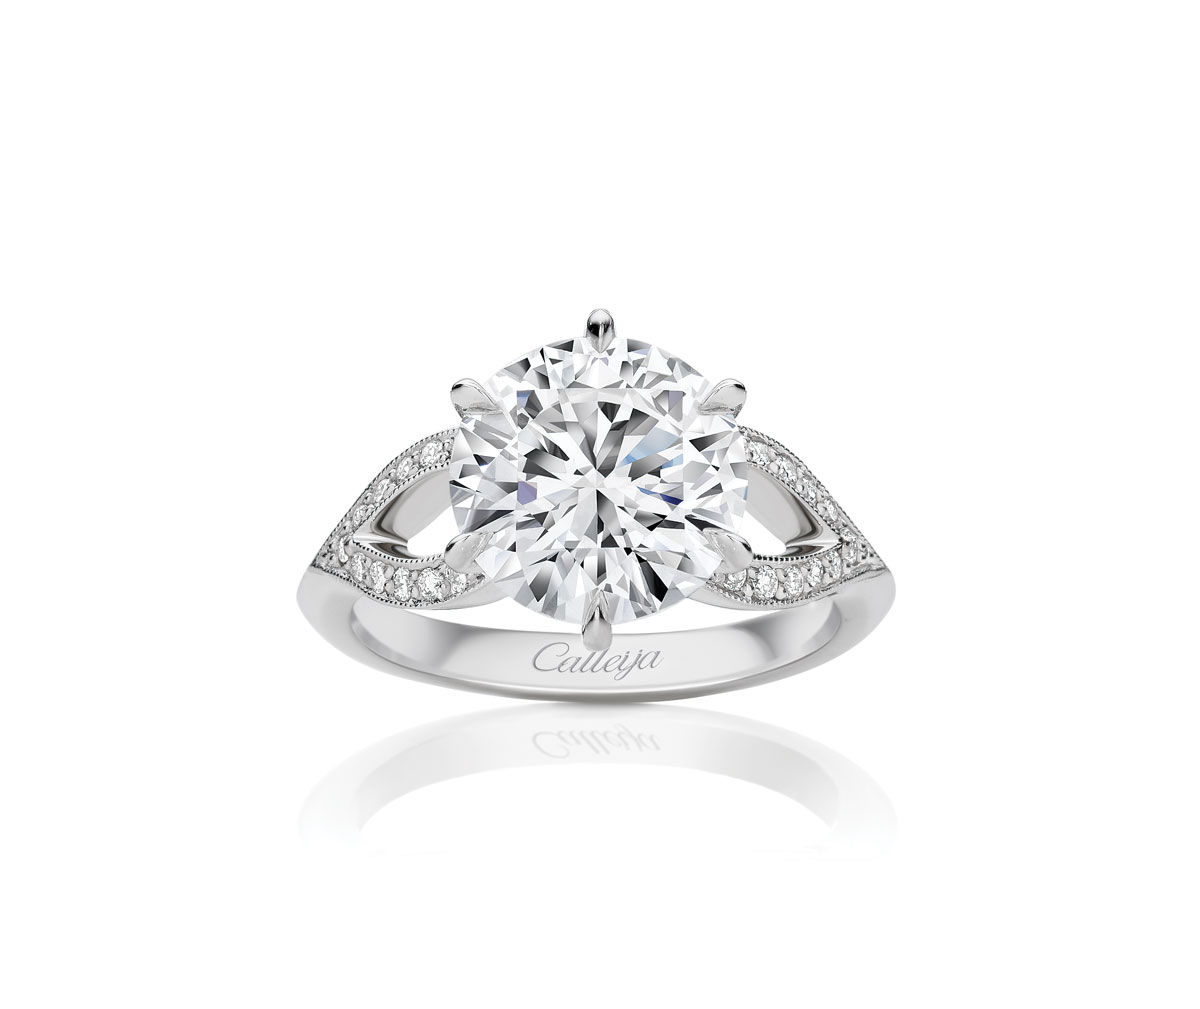 Ring Diamond Calleija - Strategy, Art Direction, Branding, Graphic & Digital Design Advertising Pacifica agency Byron Bay